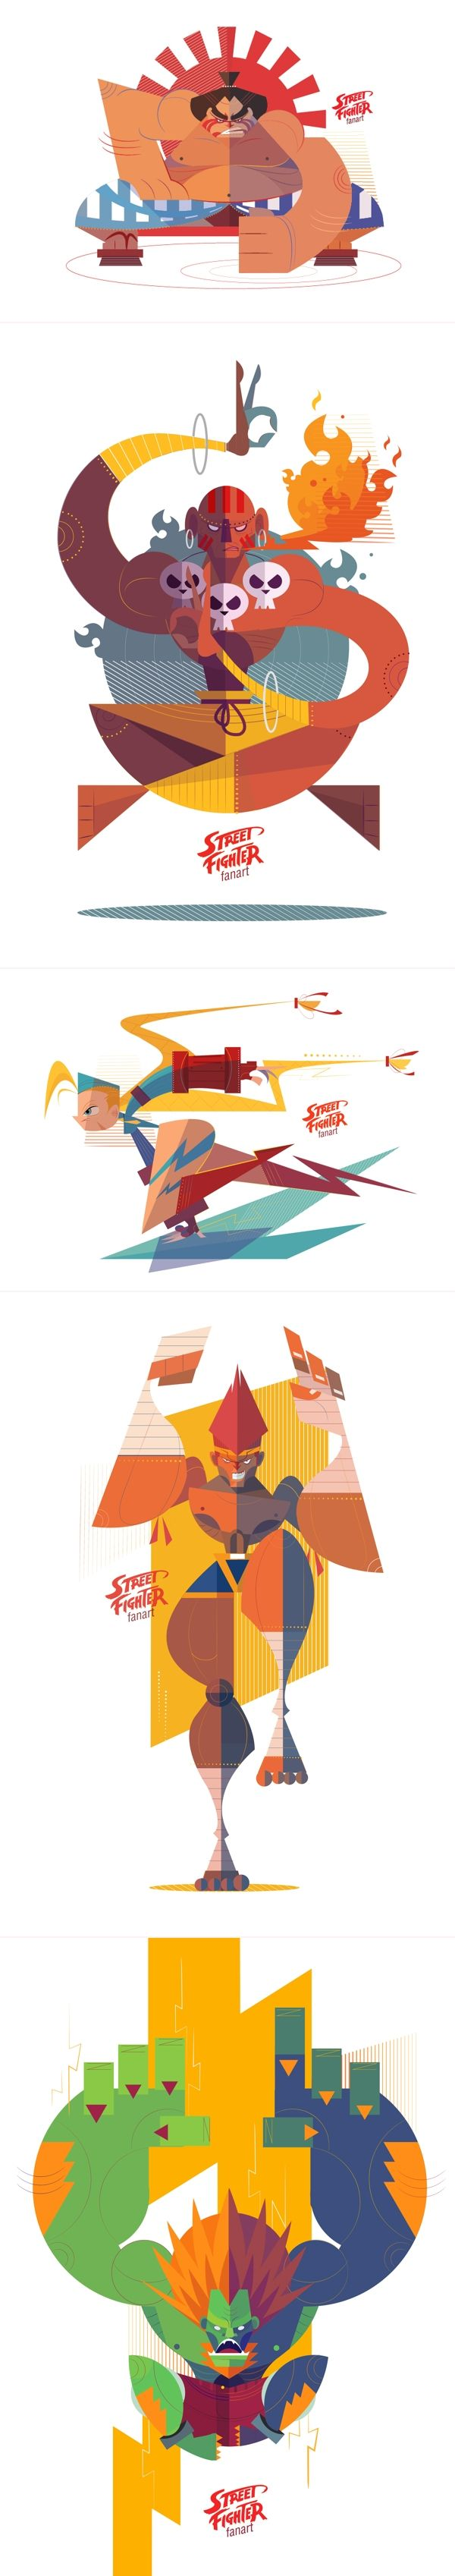 Street Fighter by Phuwadon Thongnoum